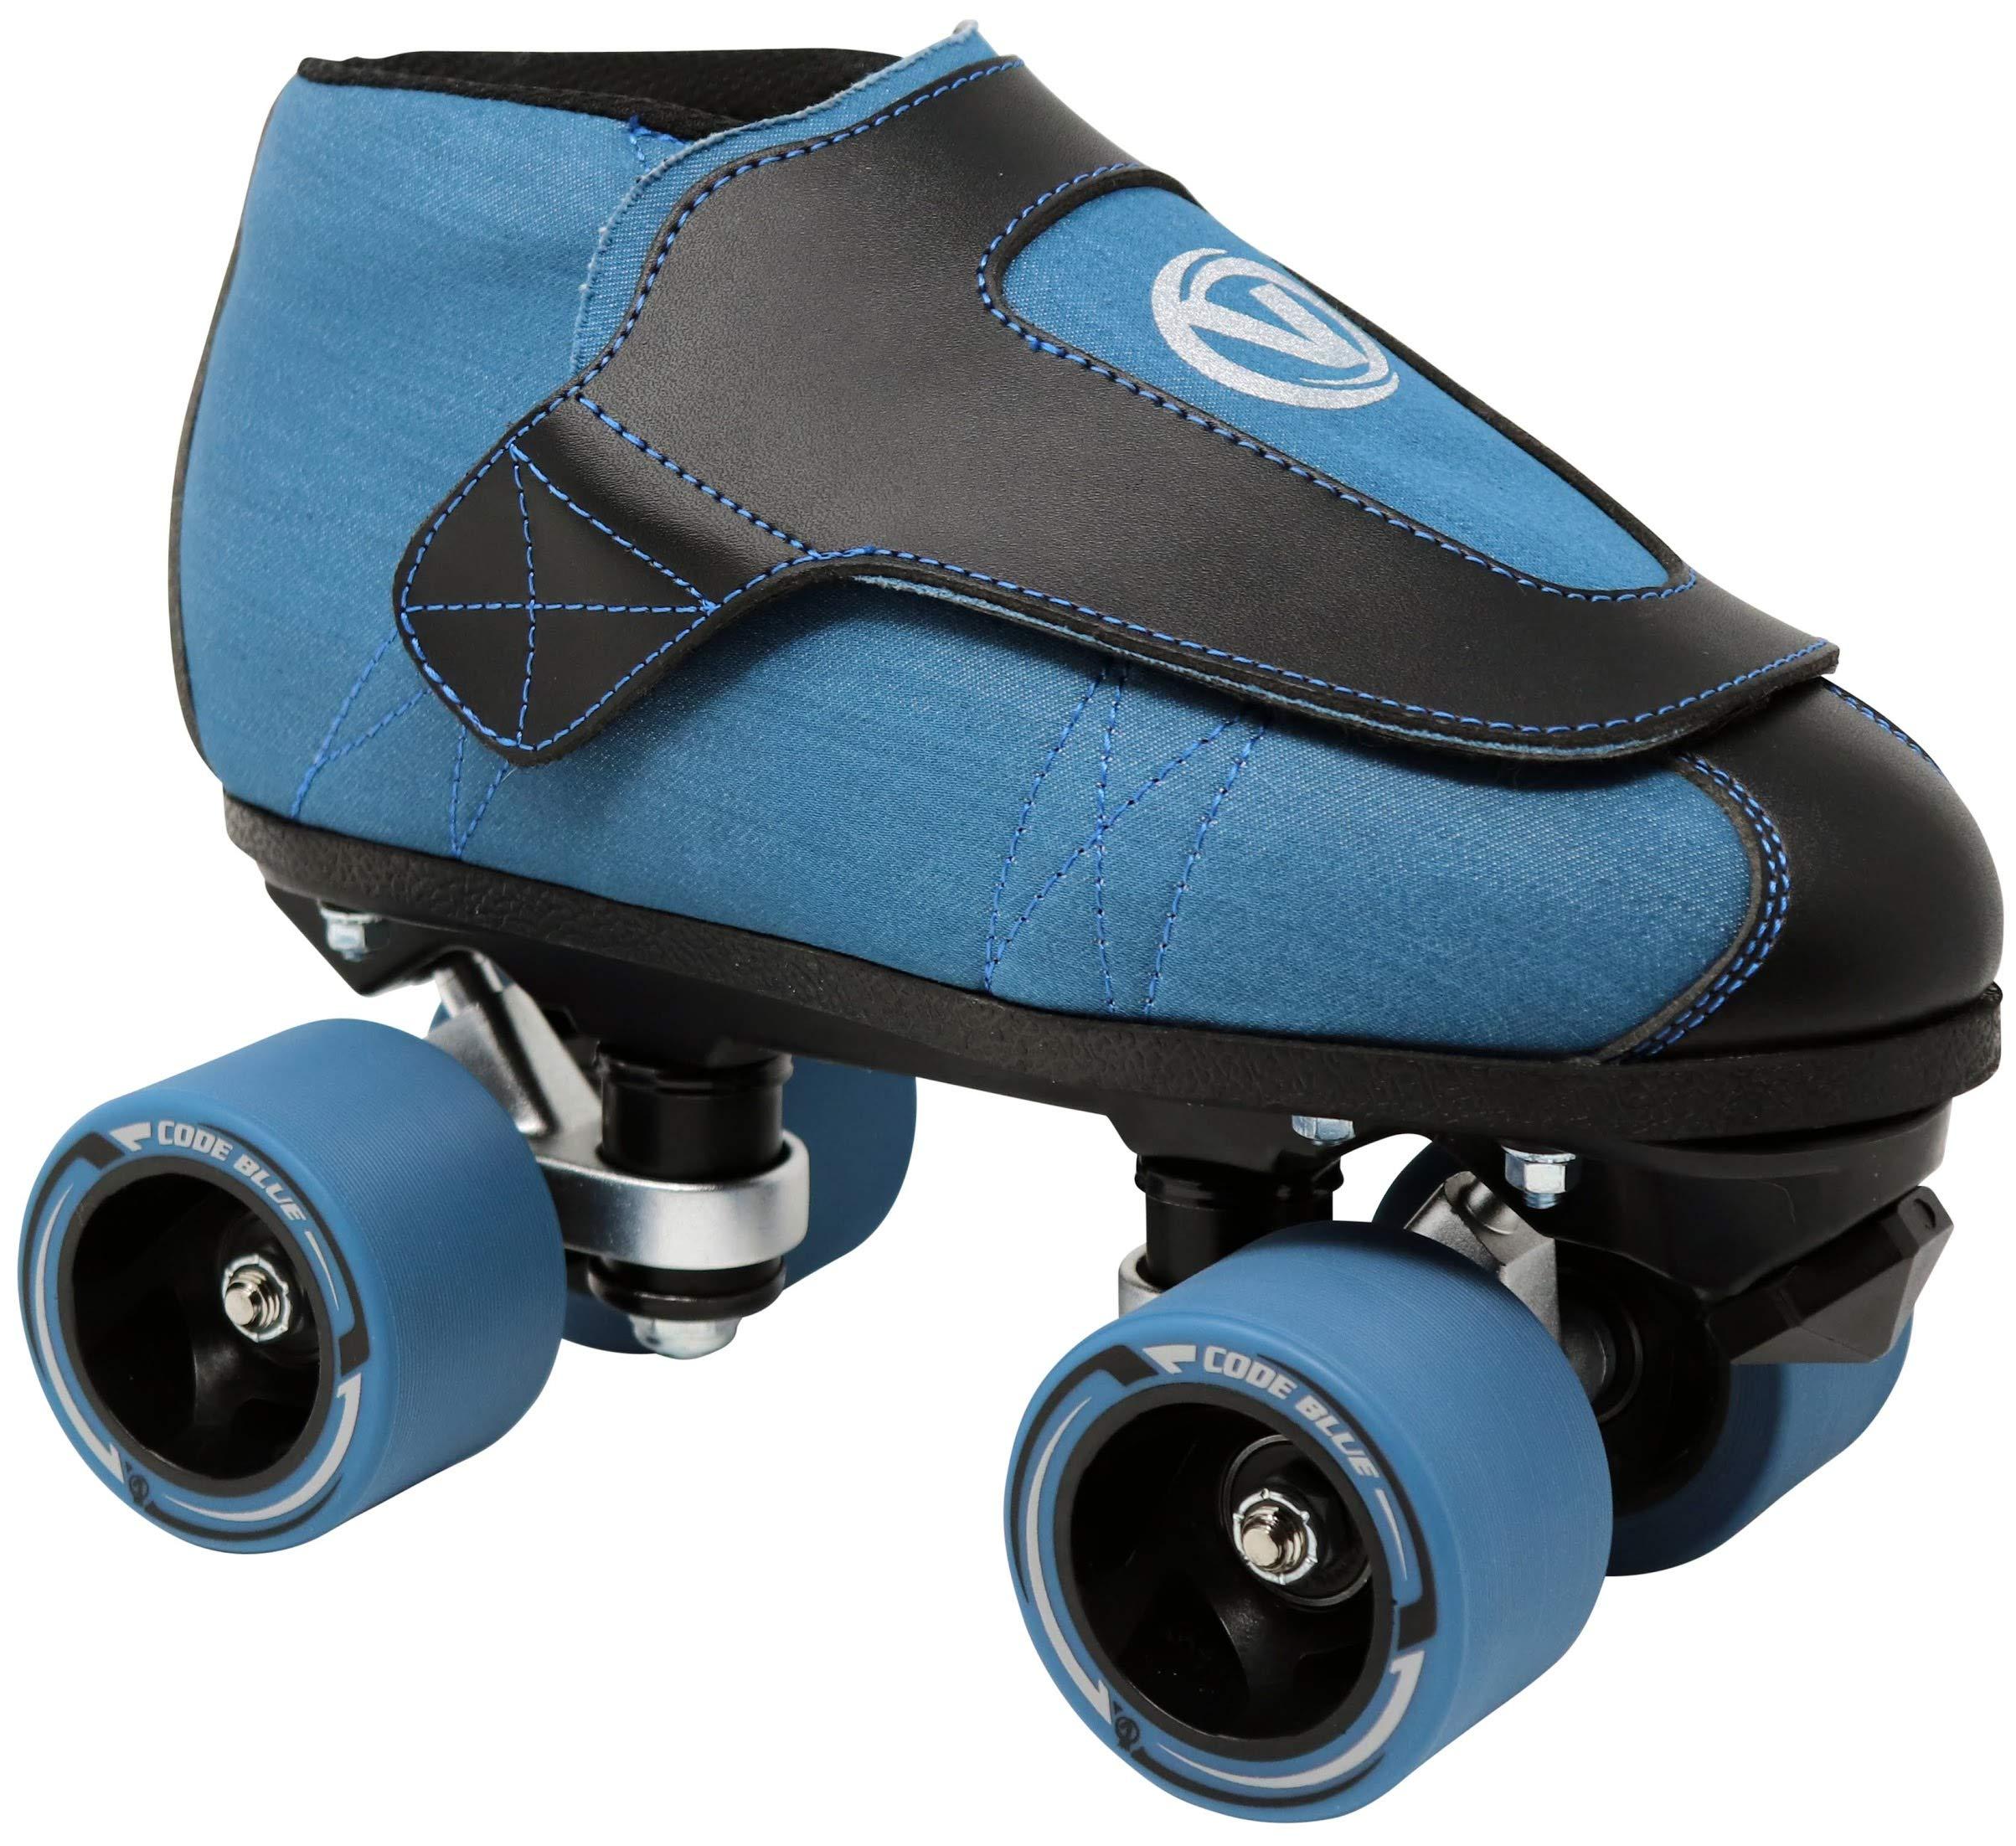 VNLA Code Blue Jam Skate - Mens & Womens Speed Skates - Quad Skates for Women & Men - Adjustable Roller Skate/Rollerskates - Outdoor & Indoor Adult Quad Skate - Kid/Kids Roller Skates (Size 9) by VNLA (Image #1)